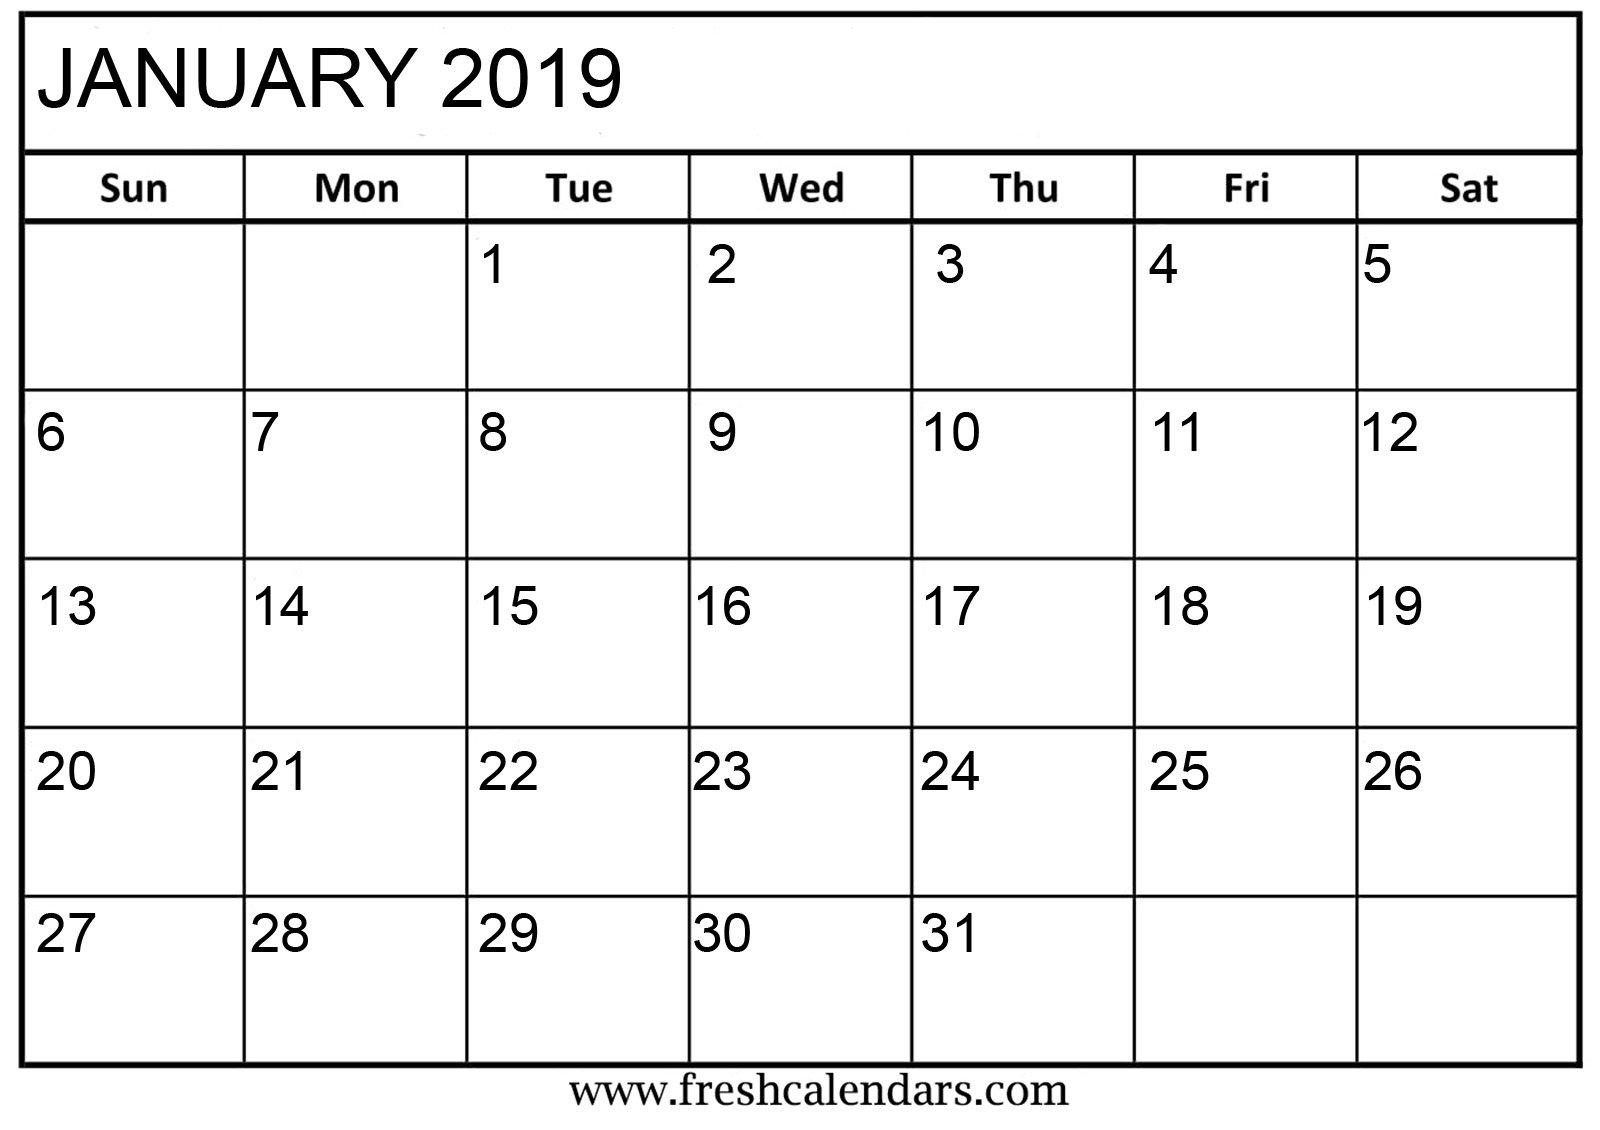 January 2019 Printable Calendars – Fresh Calendars Calendar 2019 Empty